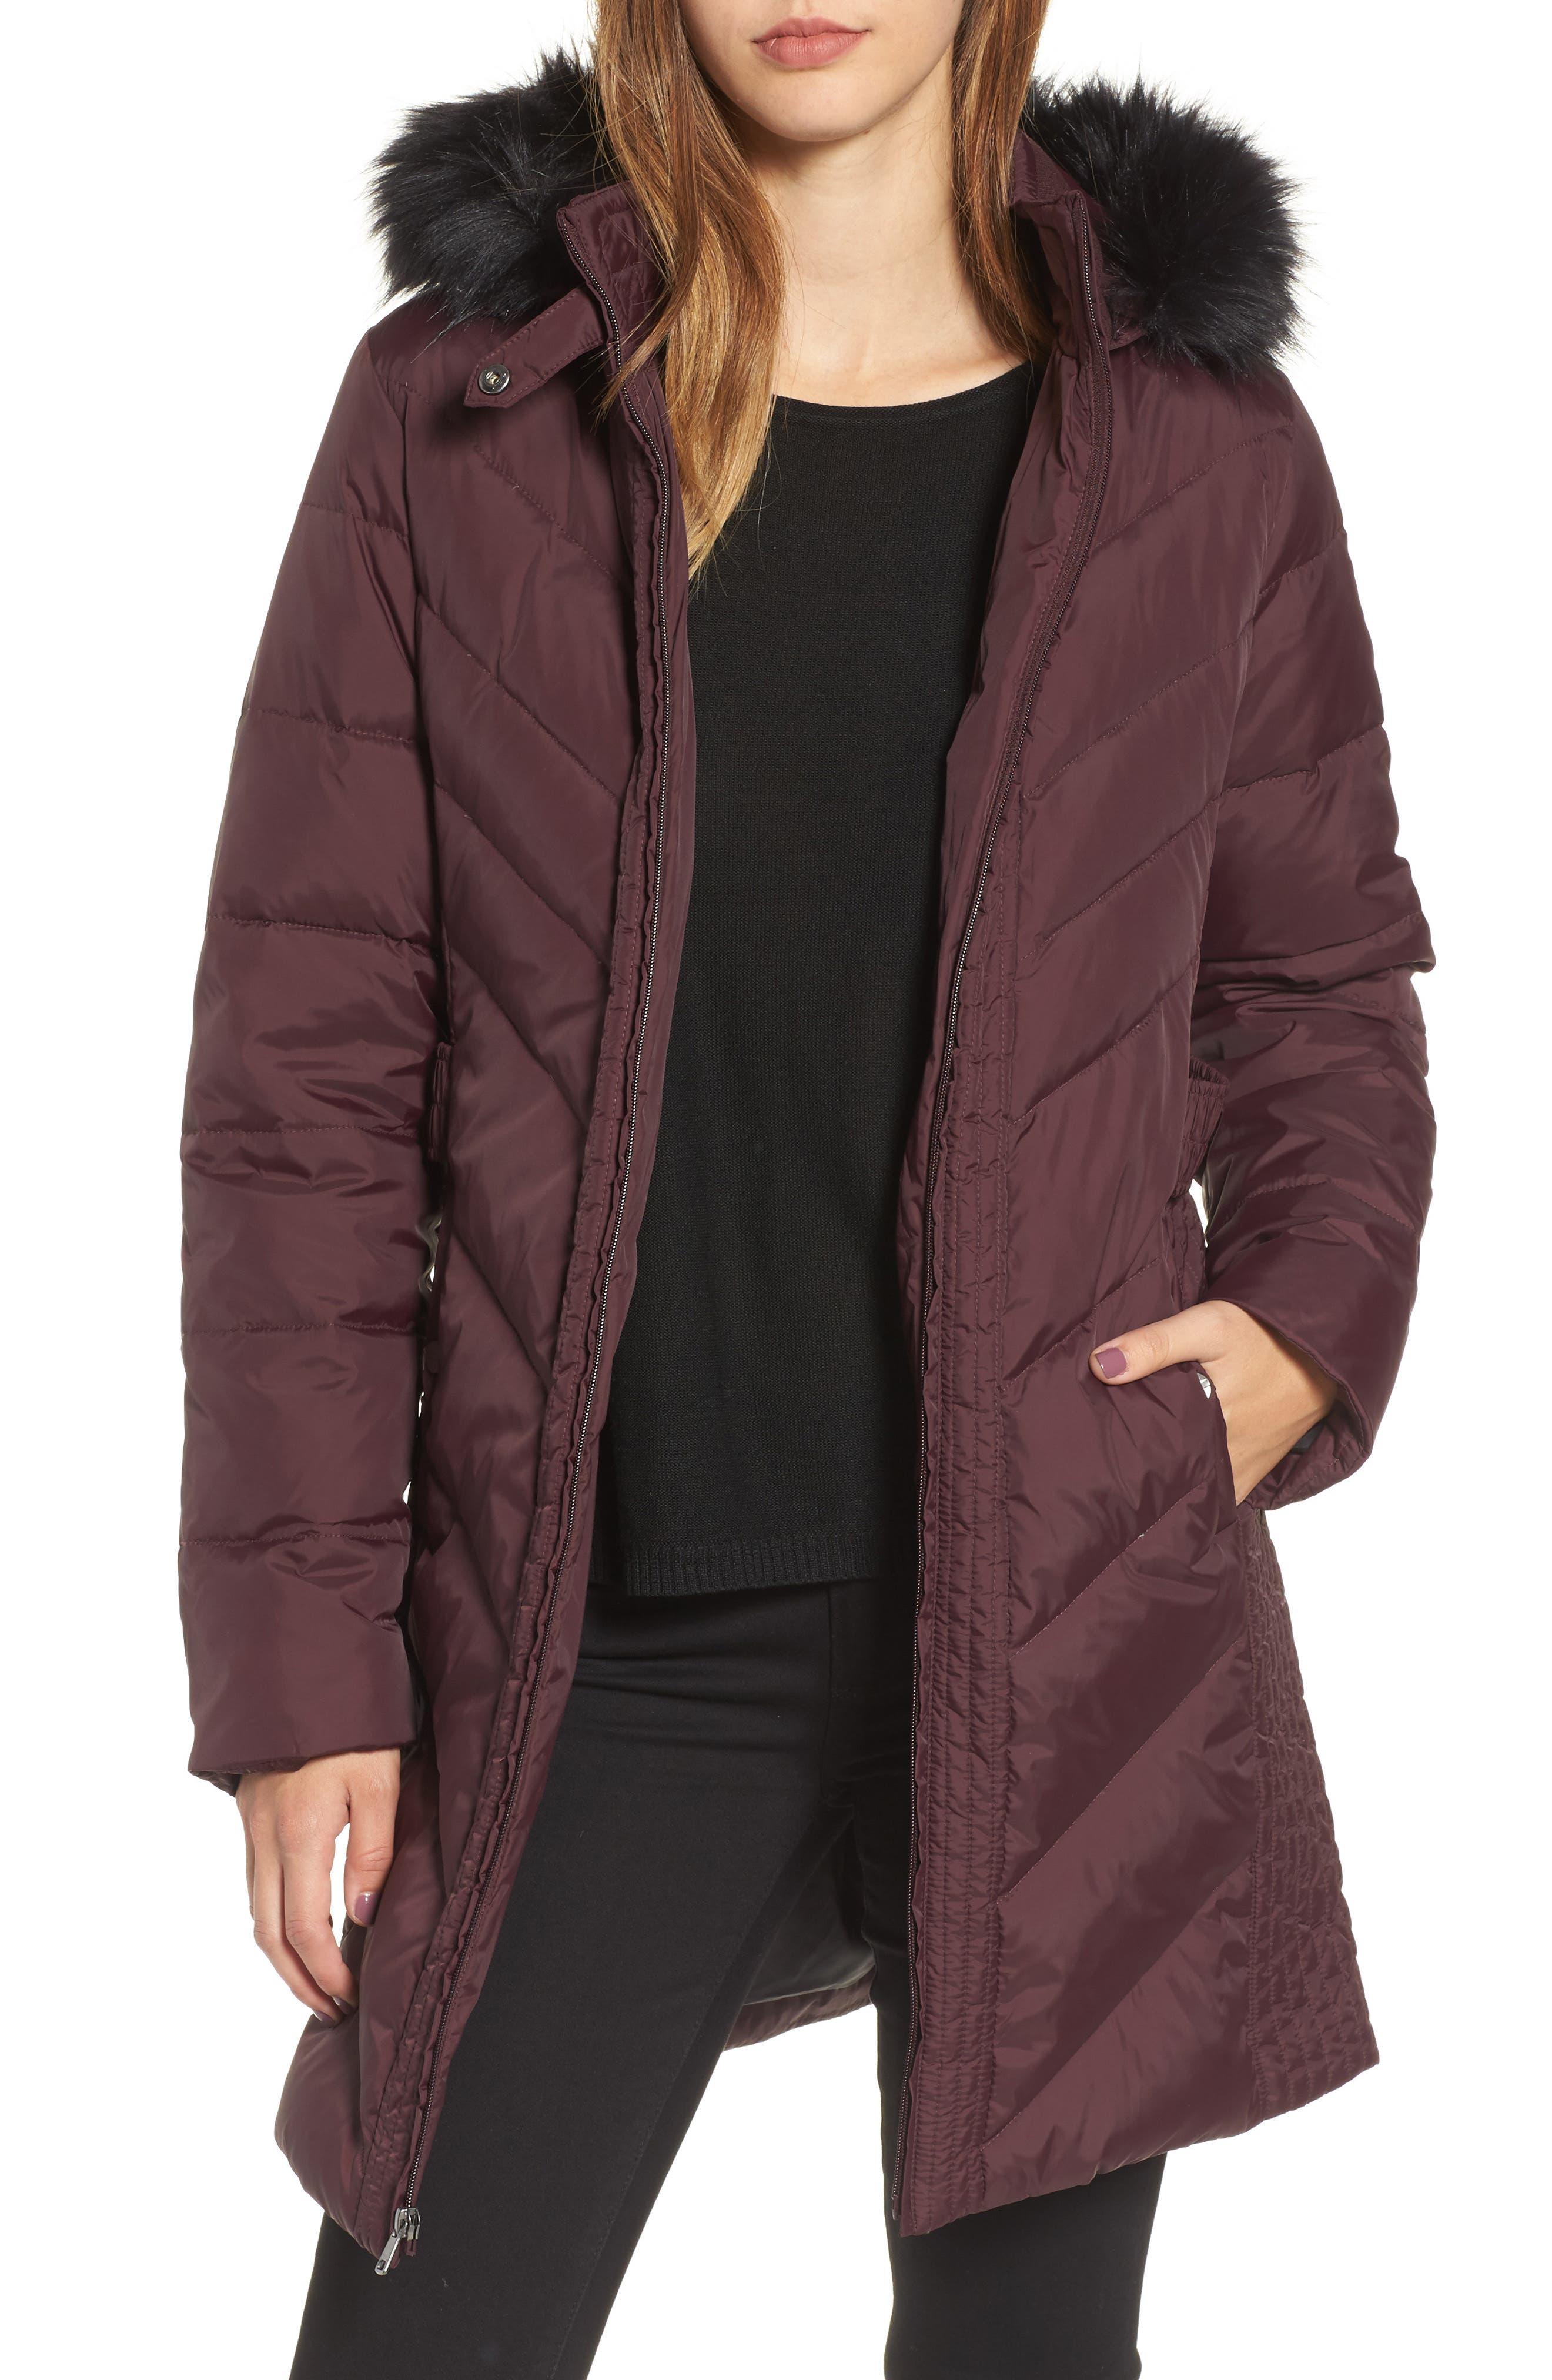 Alternate Image 1 Selected - Larry Levine Faux Fur Trim Hooded Jacket